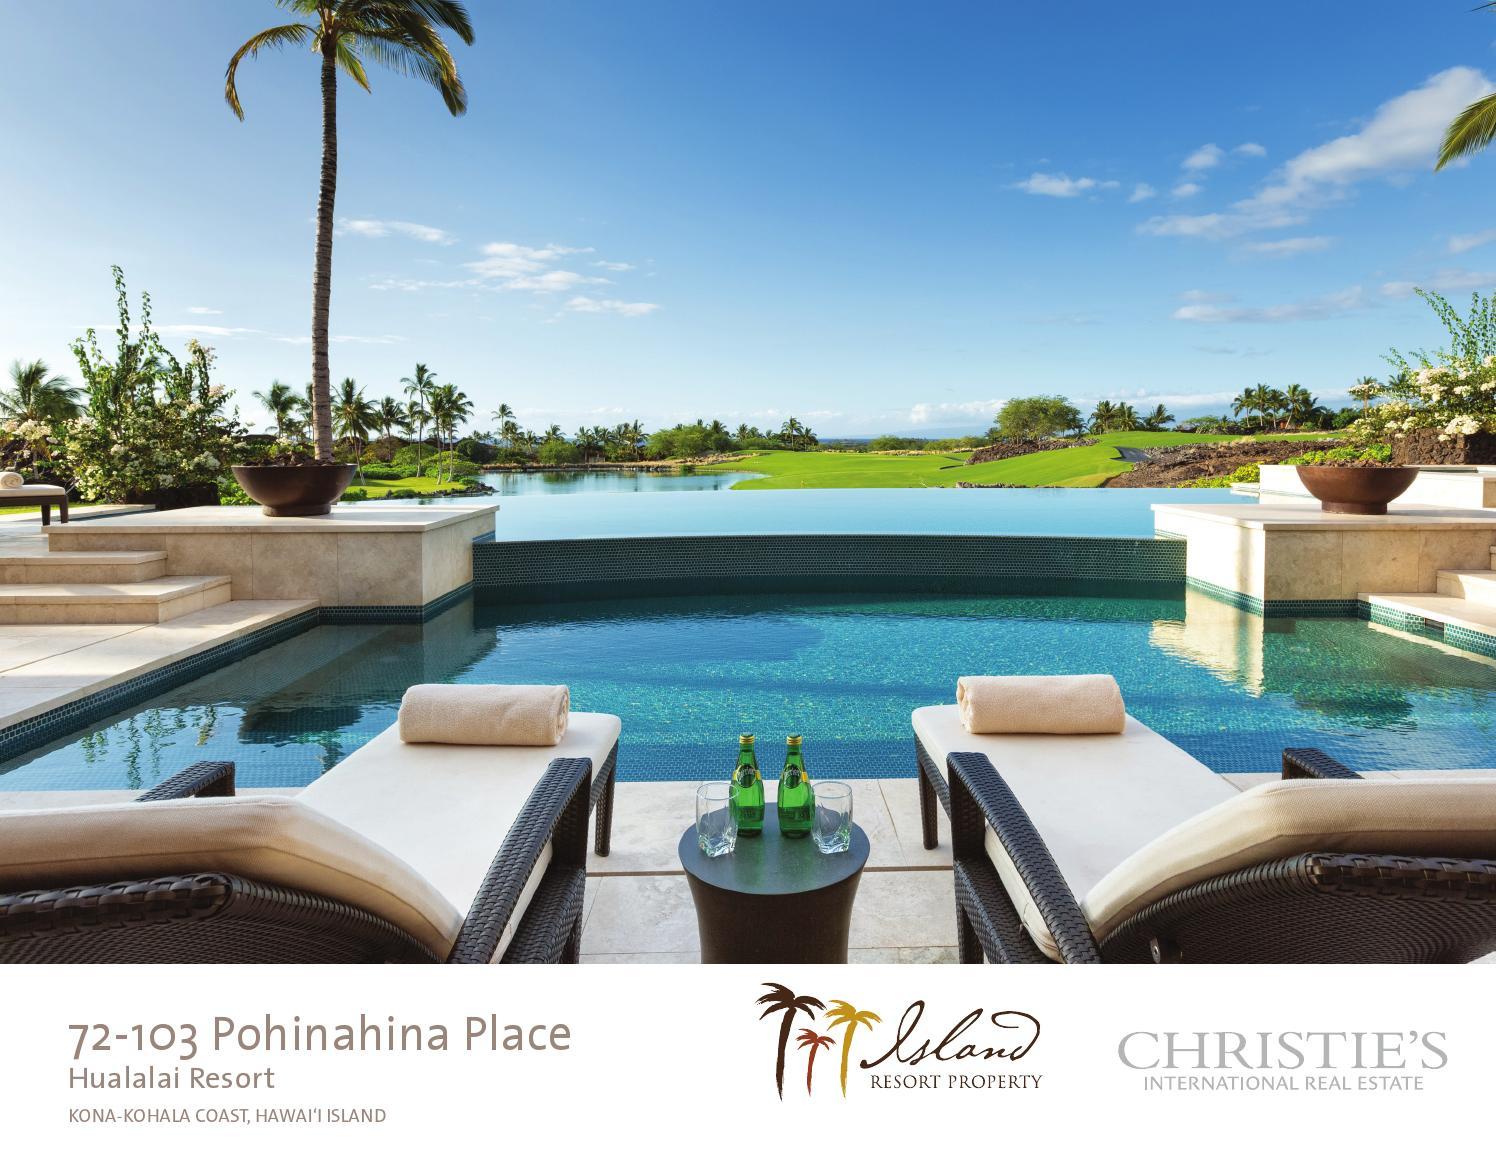 72 103 Pohinahina Place Hualalai Resort By Island Resort Property Issuu